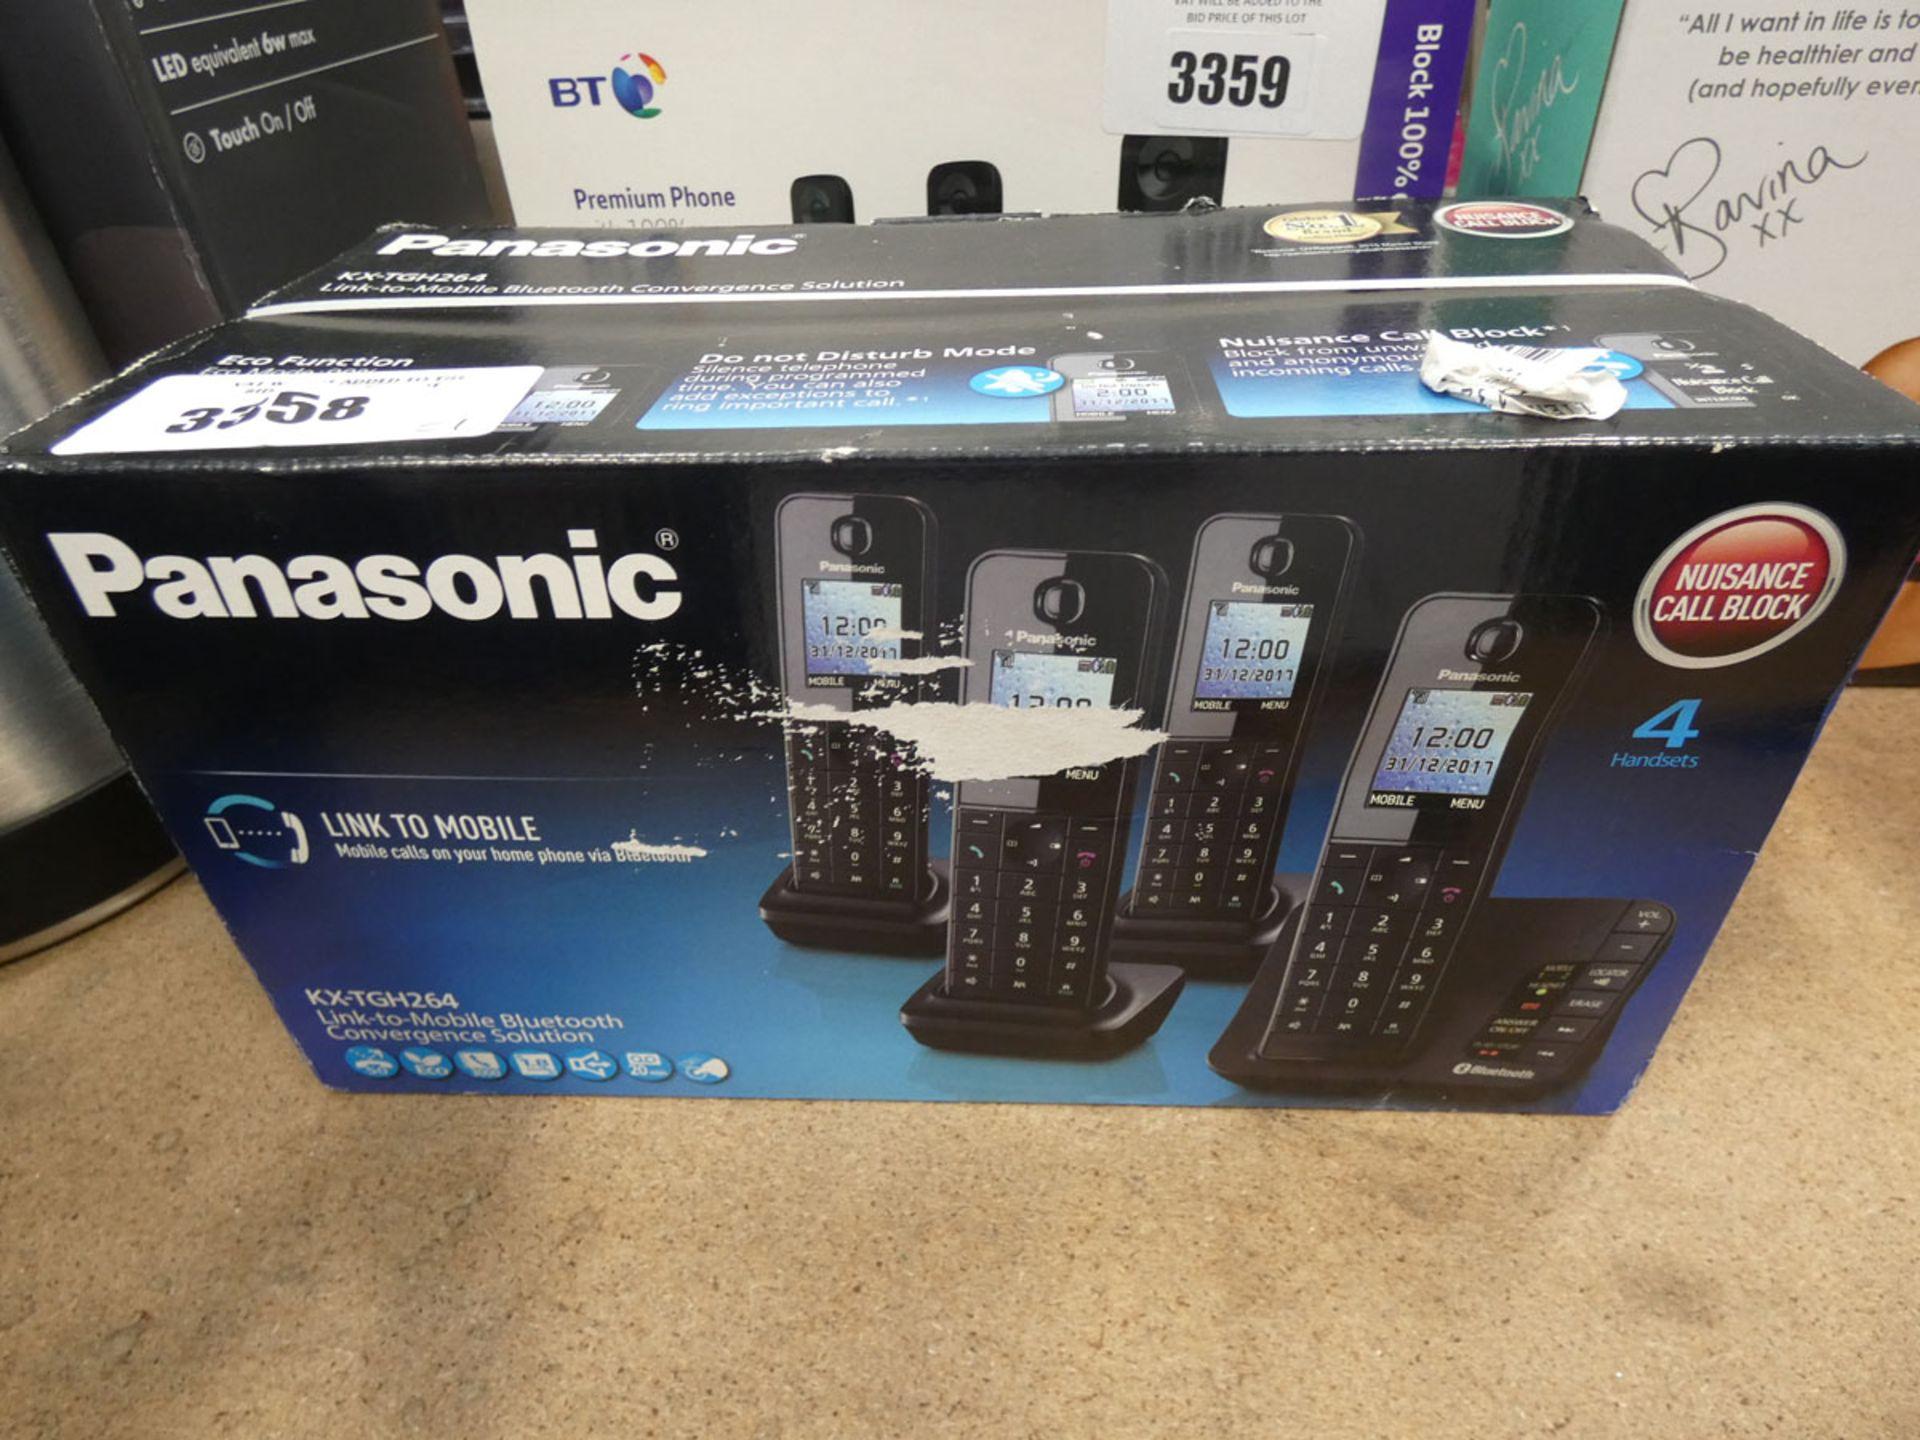 3123 - Panasonic KXTGH264 link to mobile bluetooth coverage set